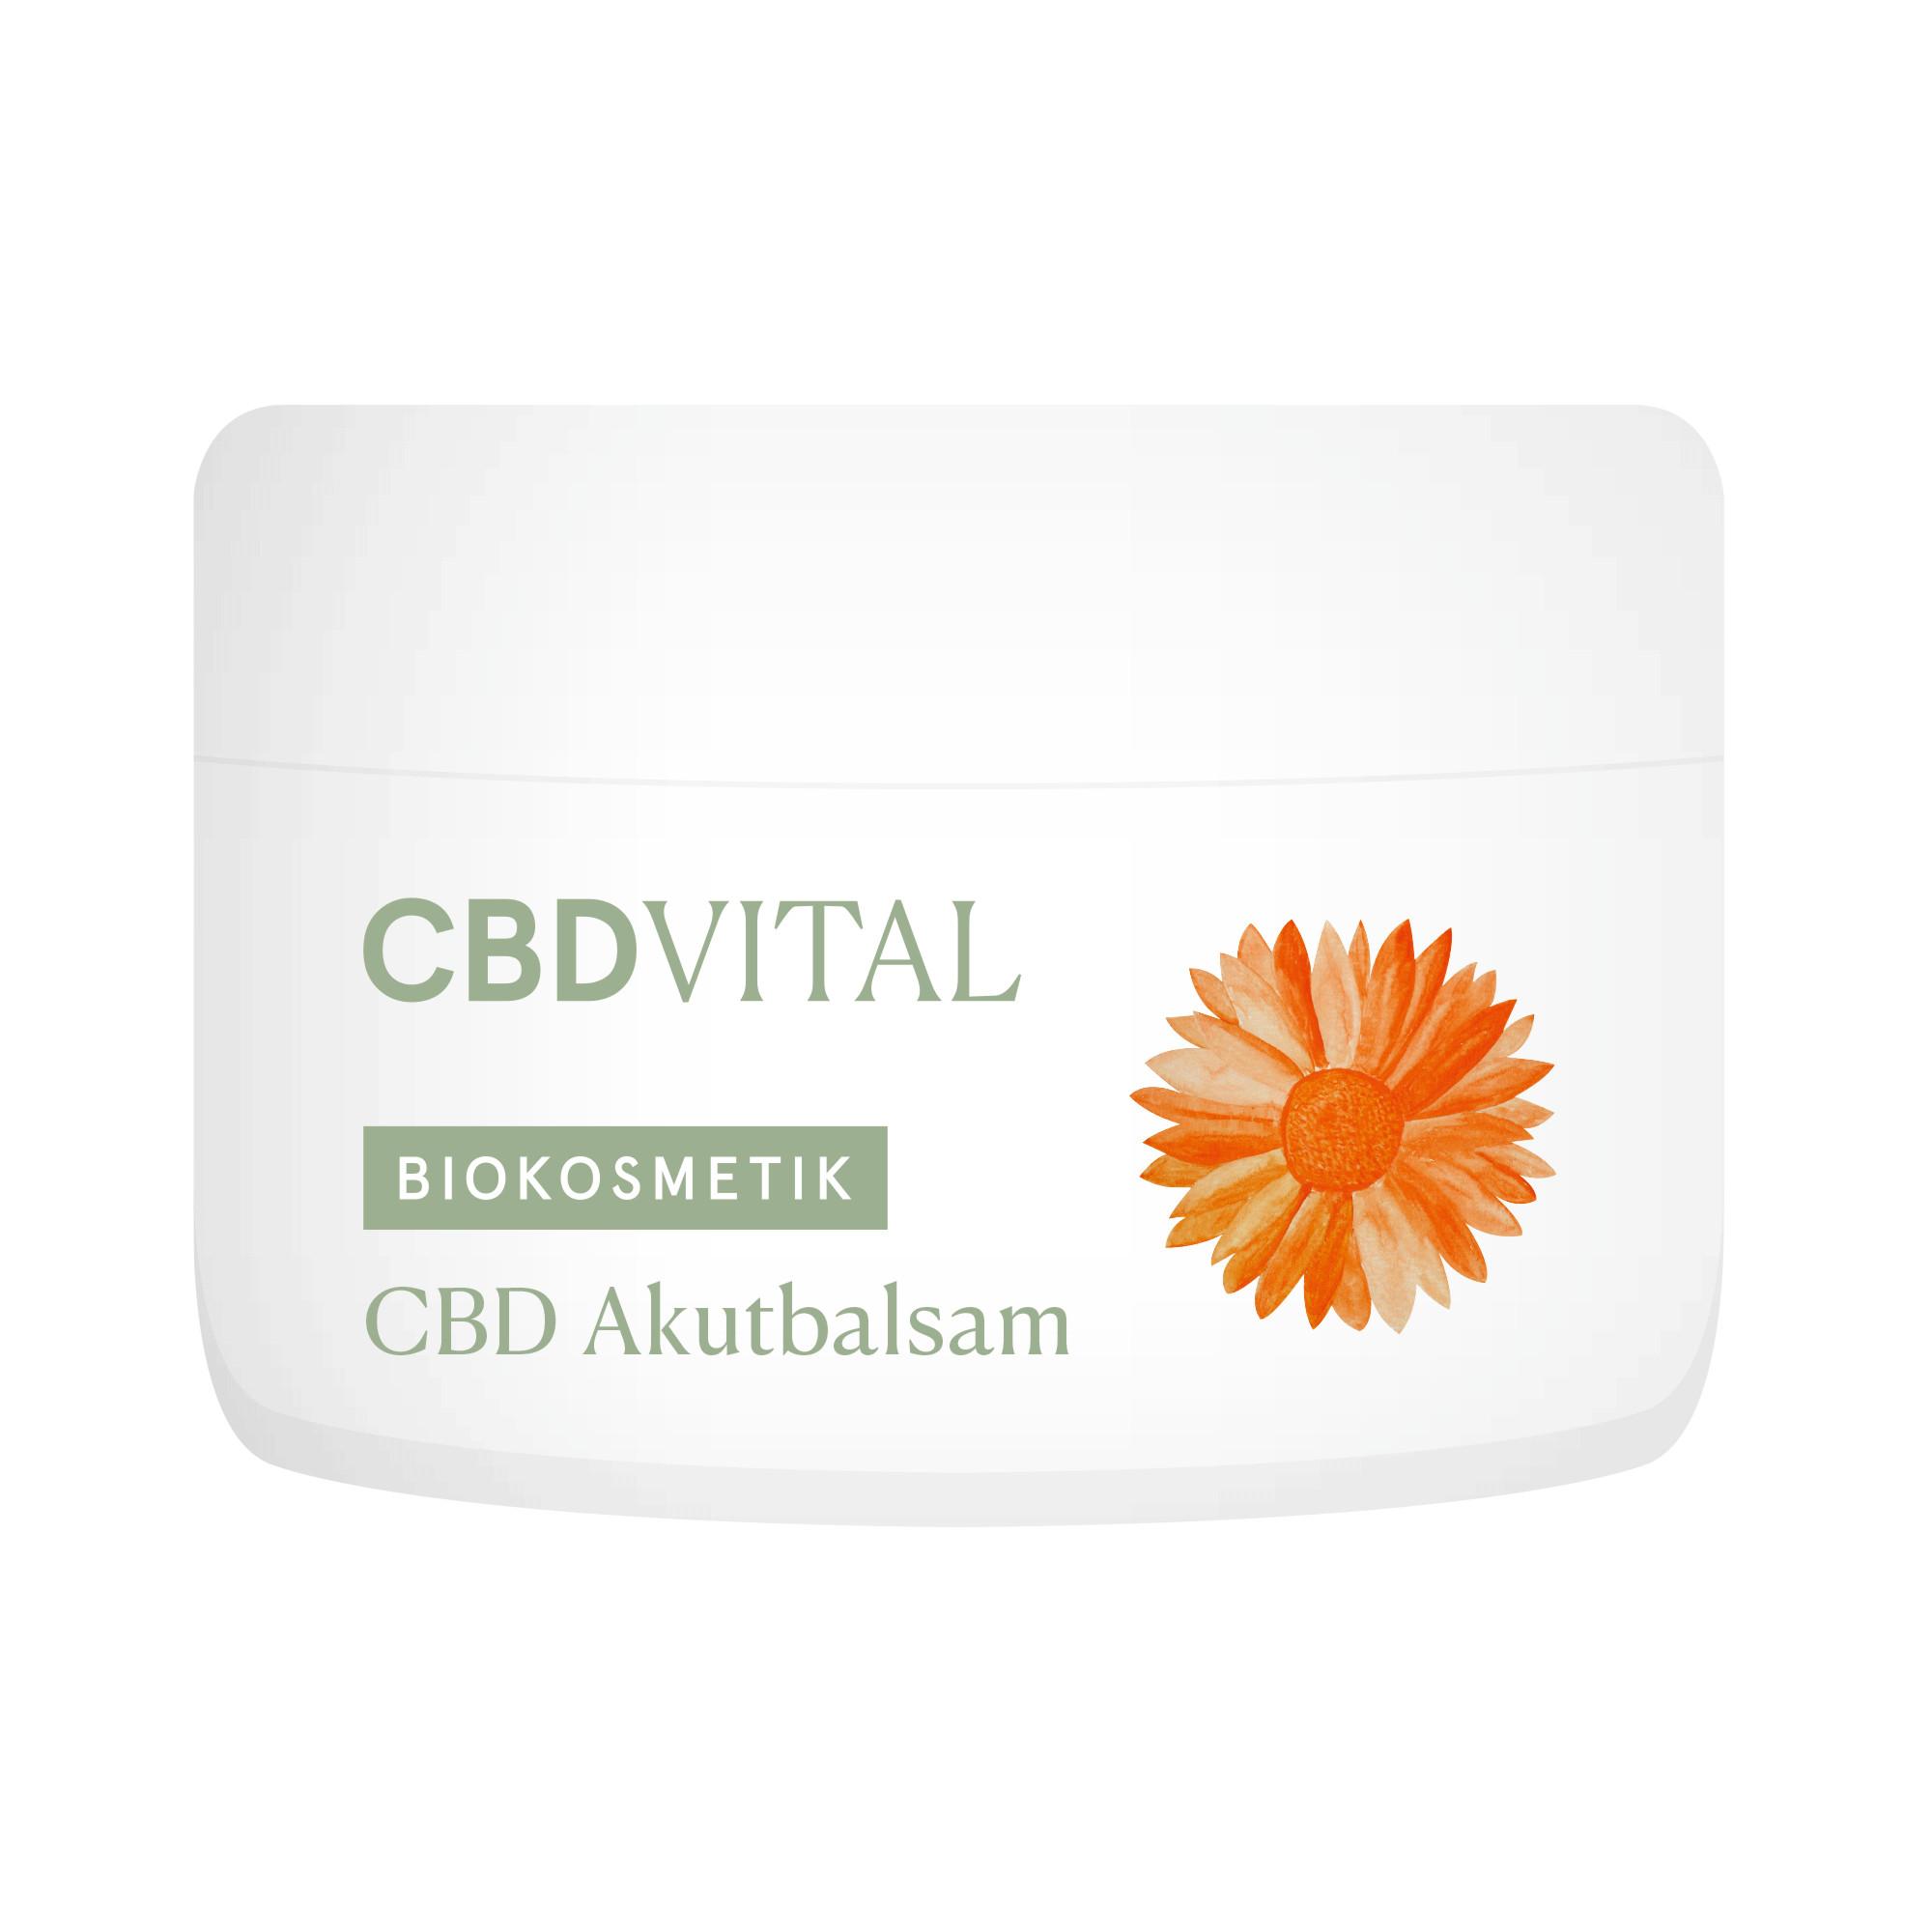 CBD-Vital CBD Akutbalsam